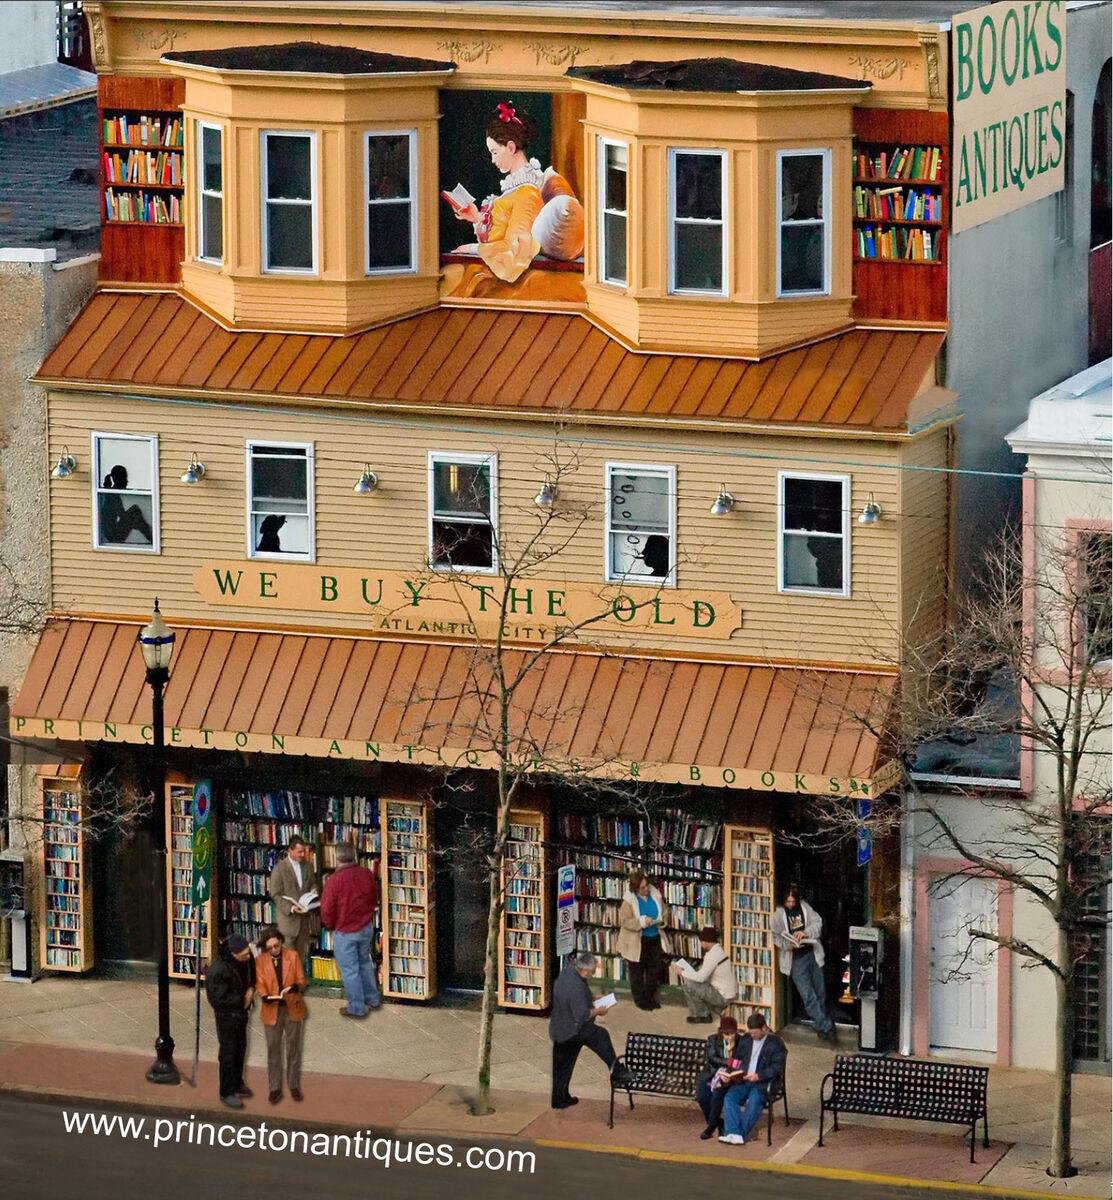 Princeton Antiques Bookshop